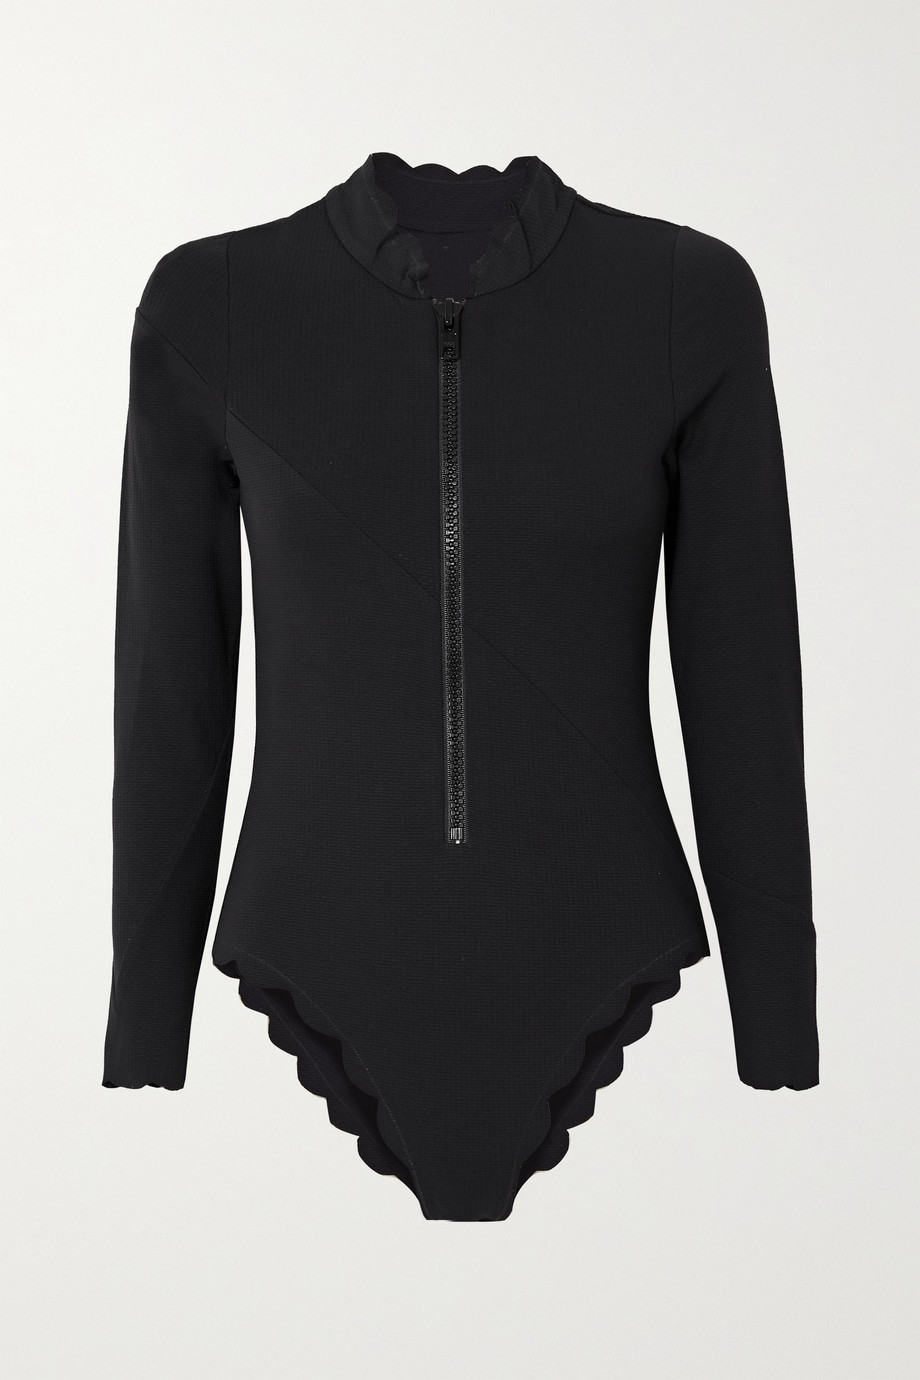 Marysia North Sea scalloped swimsuit